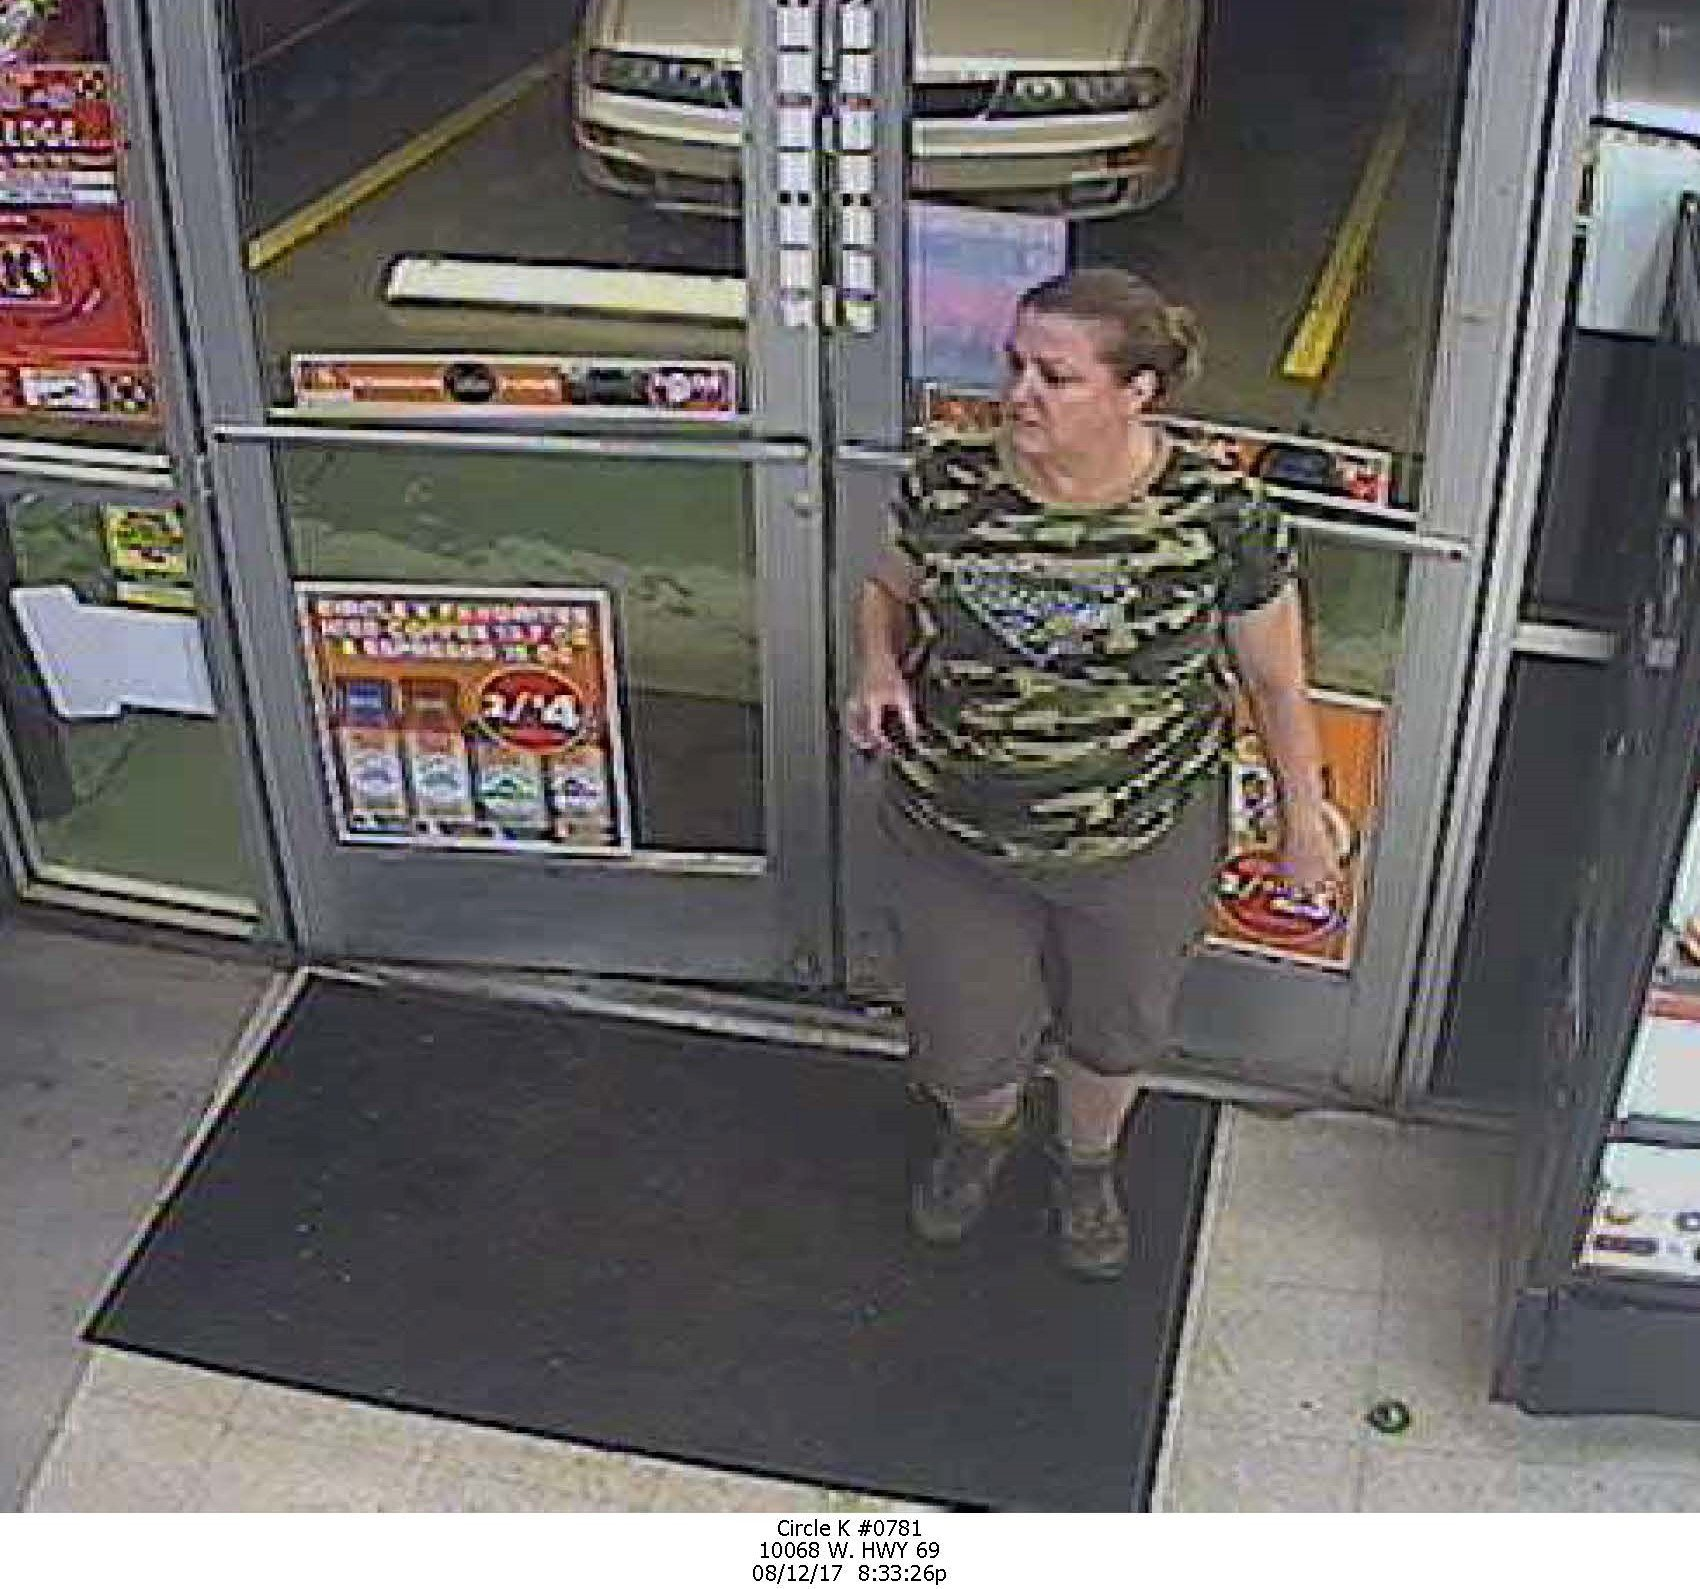 Woman suspected of passing fake $100 bill. (Source: Yavapai County Sheriff)